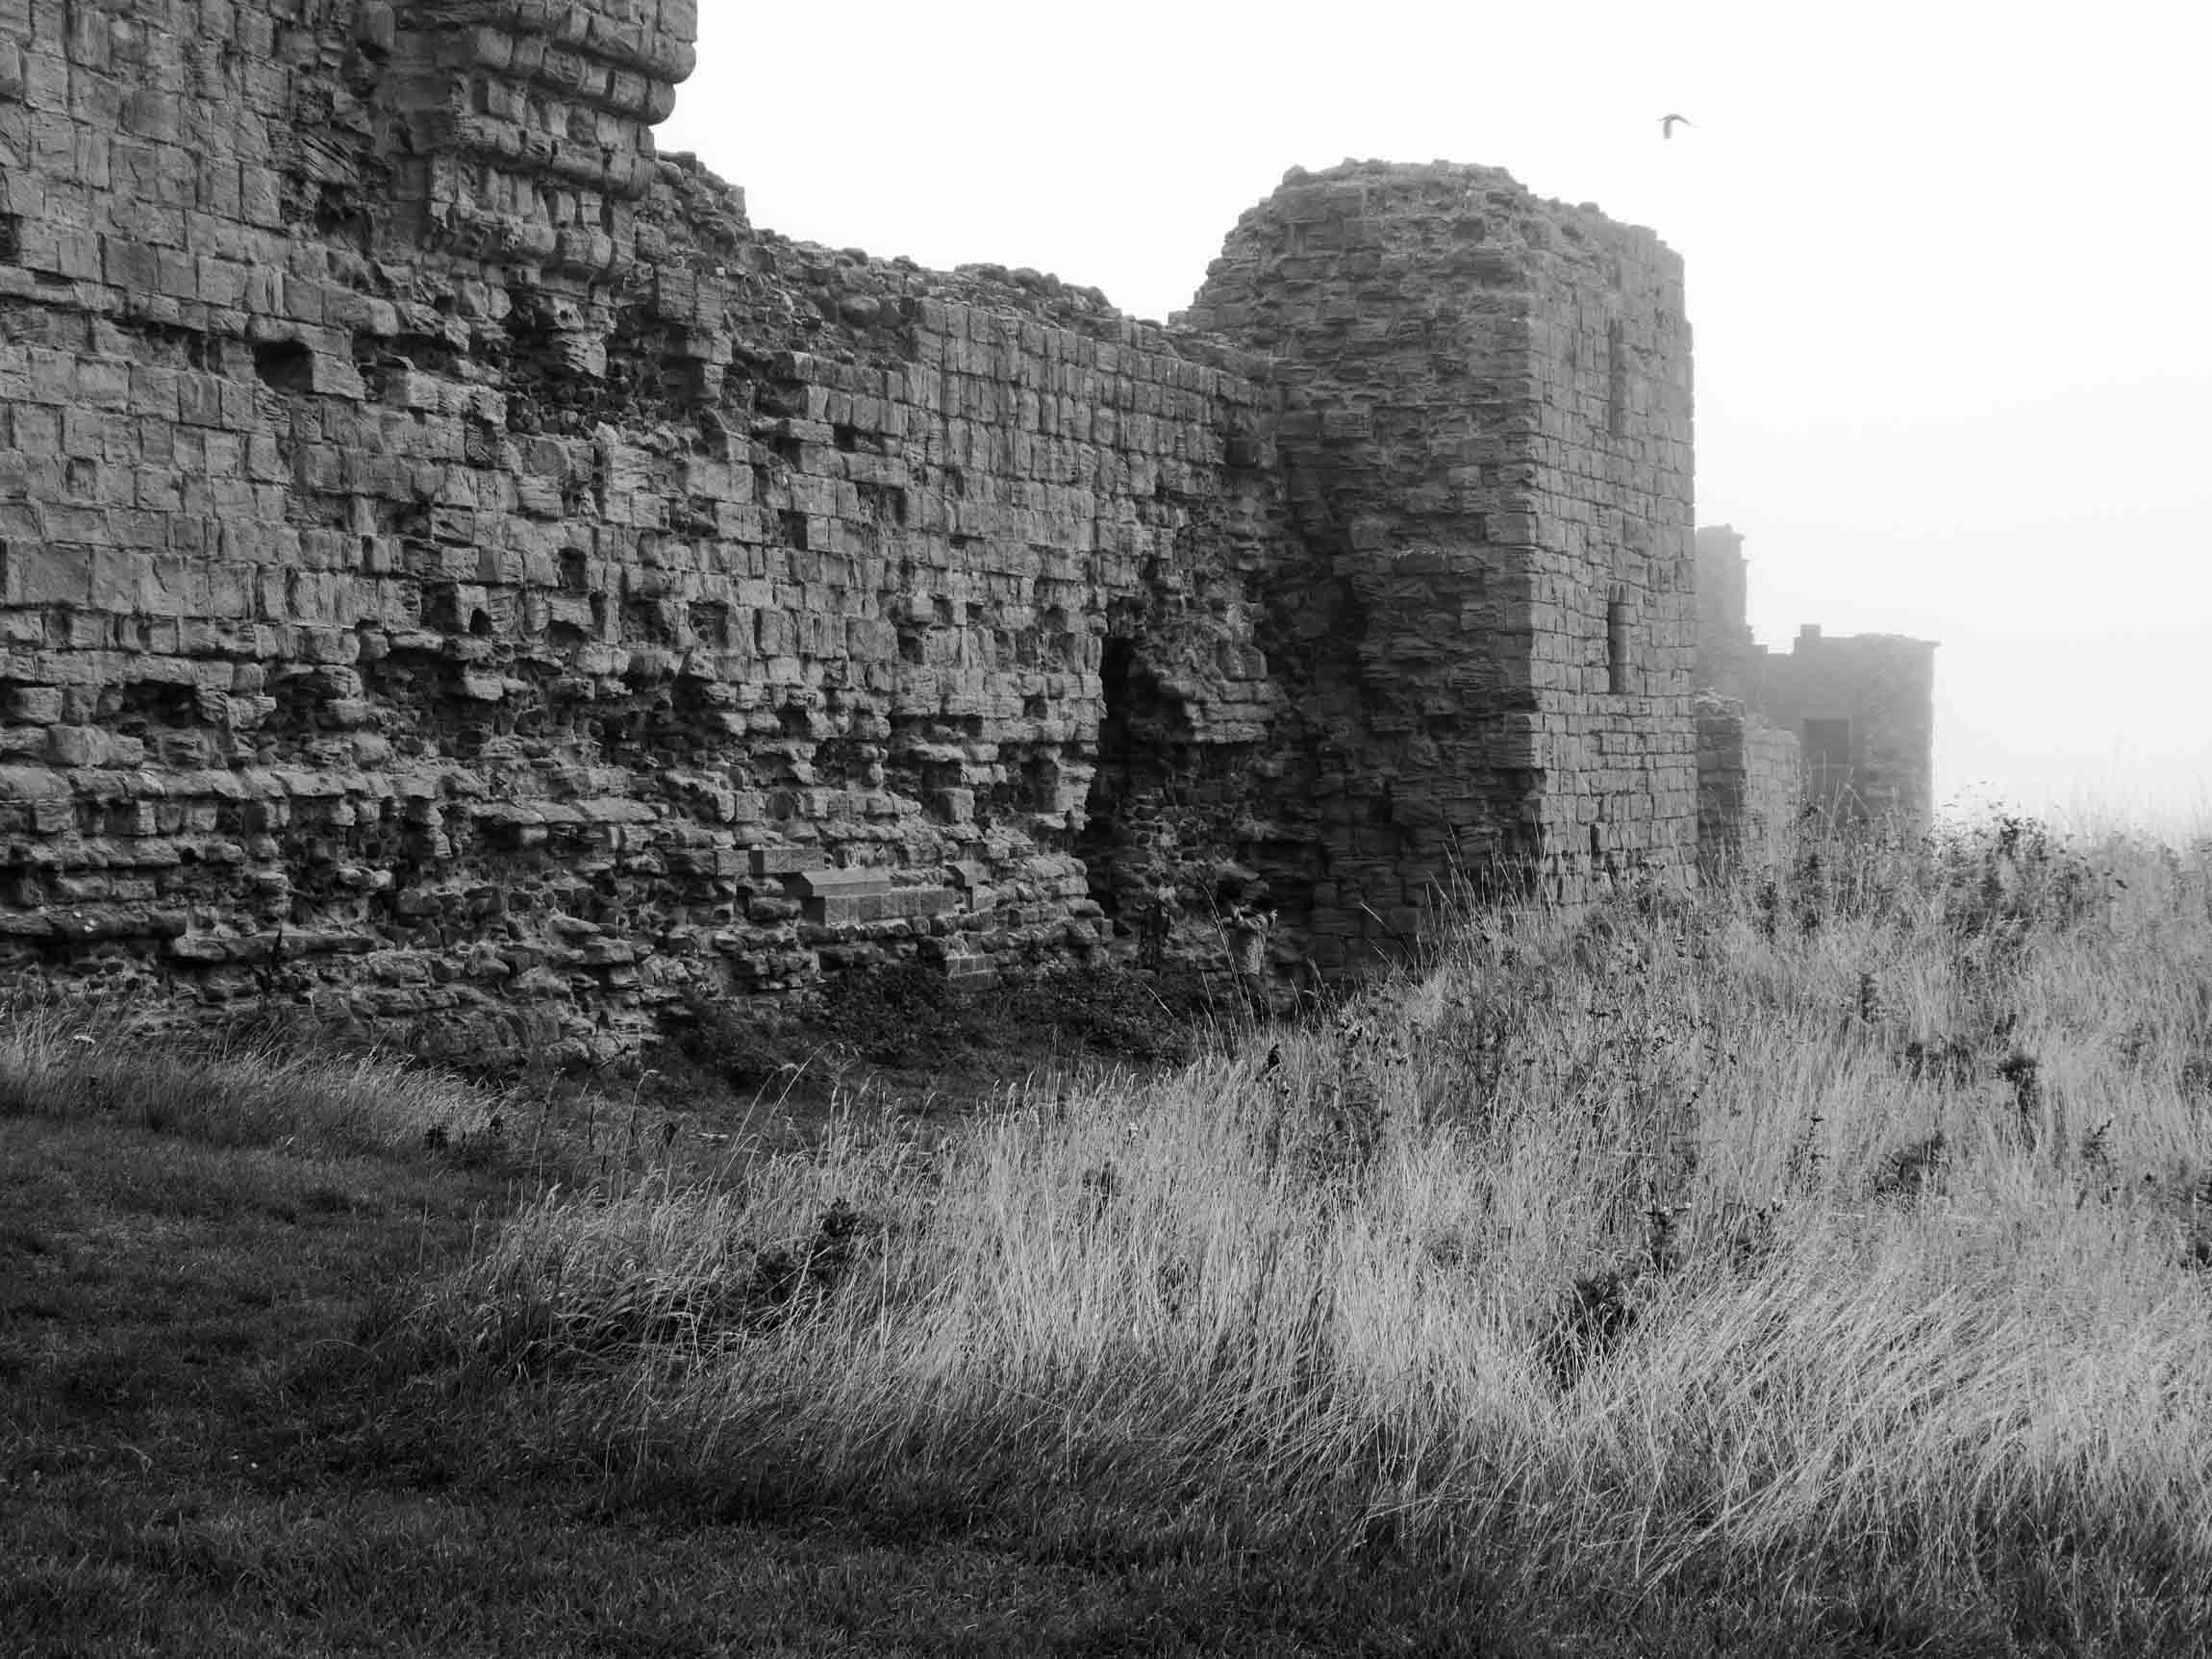 Castle wall, black & white shot